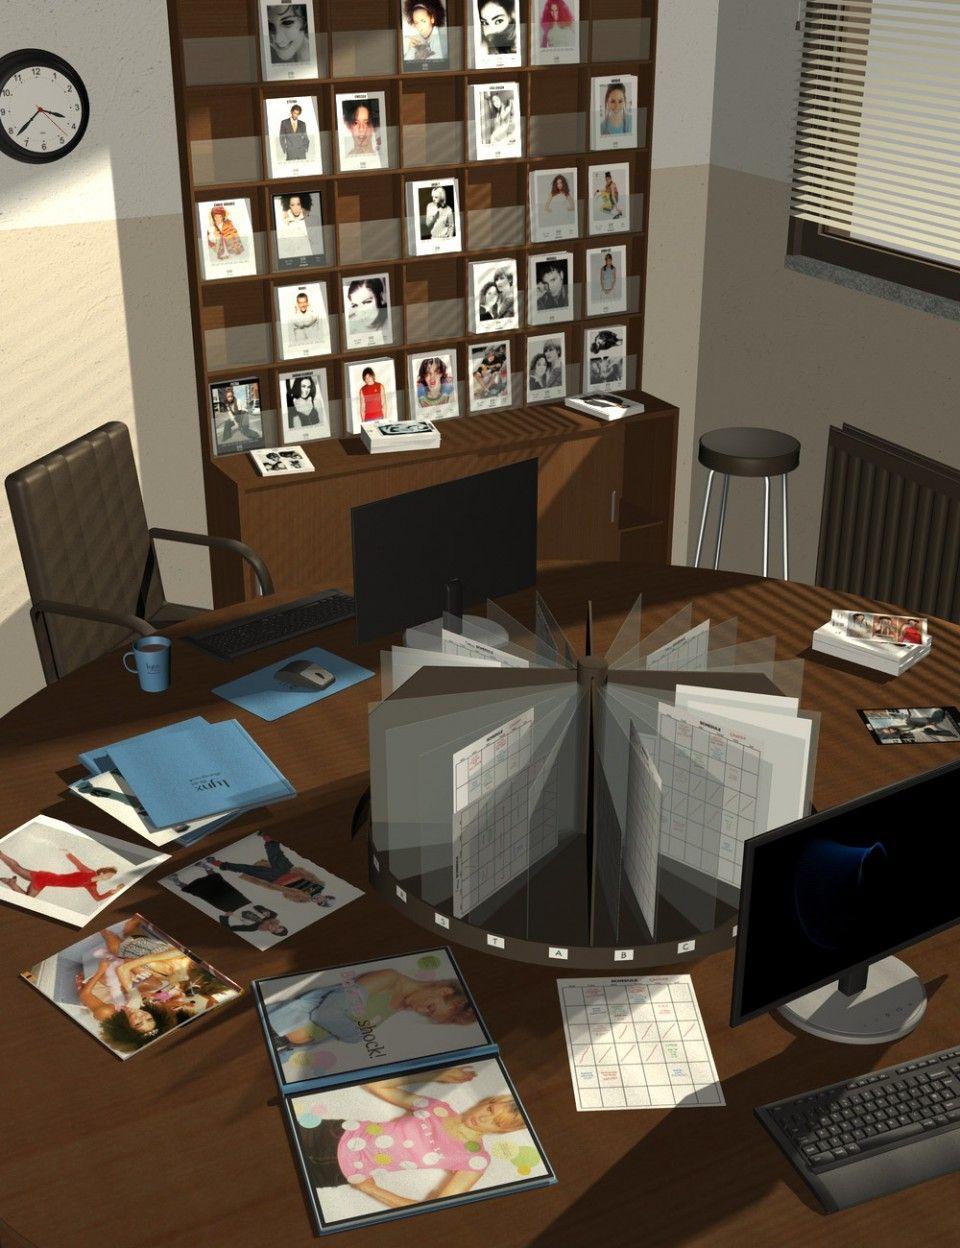 Best Free 3d Room Design Software: Model Agency, Agency Office